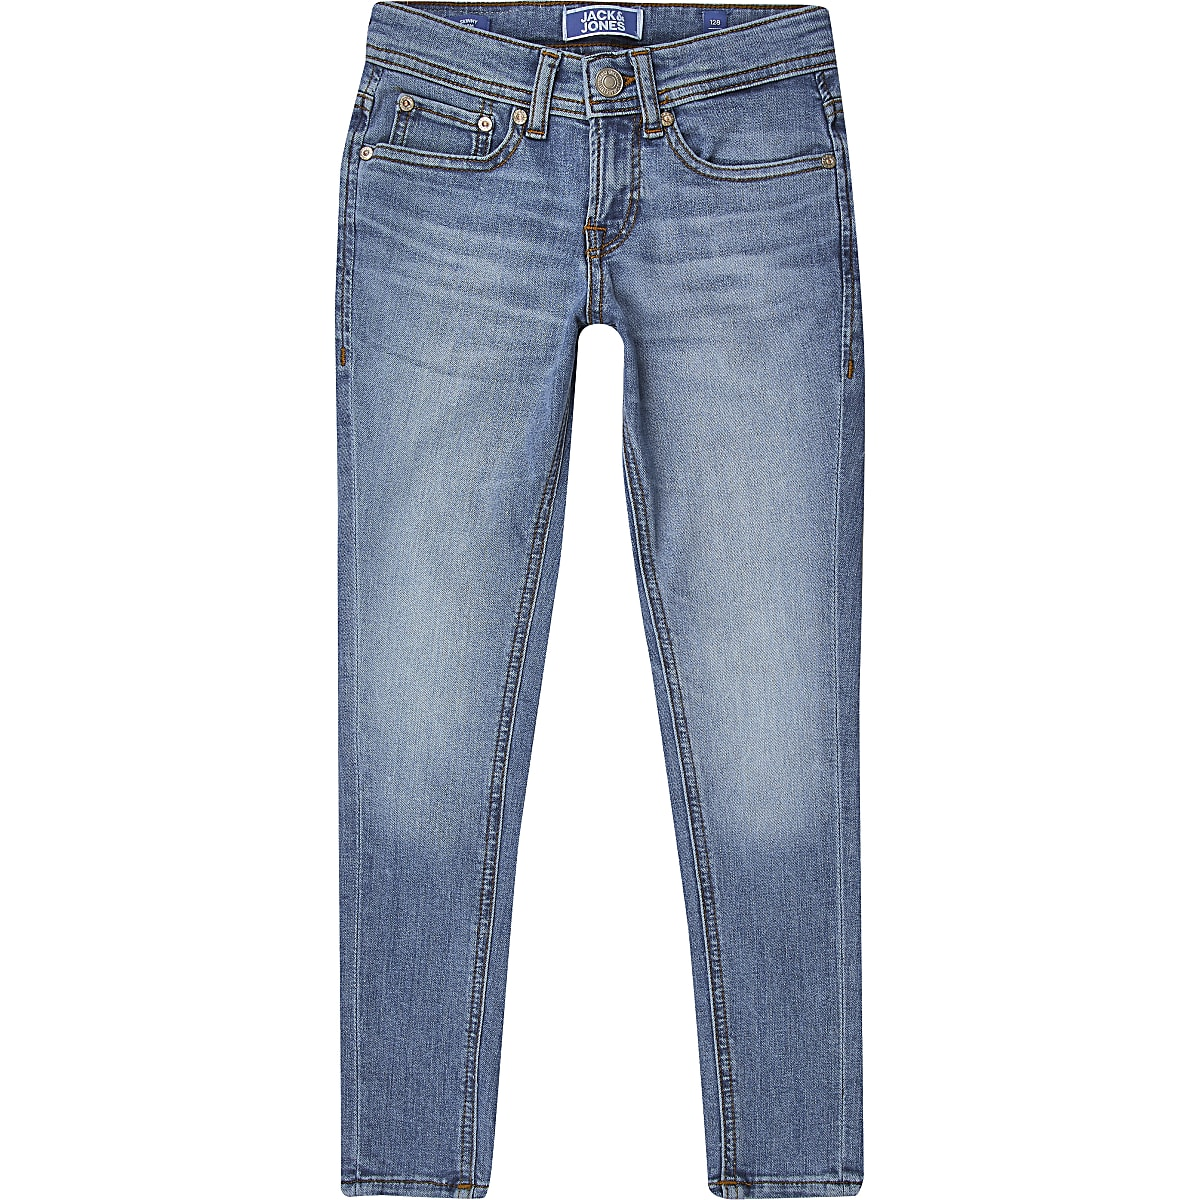 Boys Jack & Jones blue skinny jeans